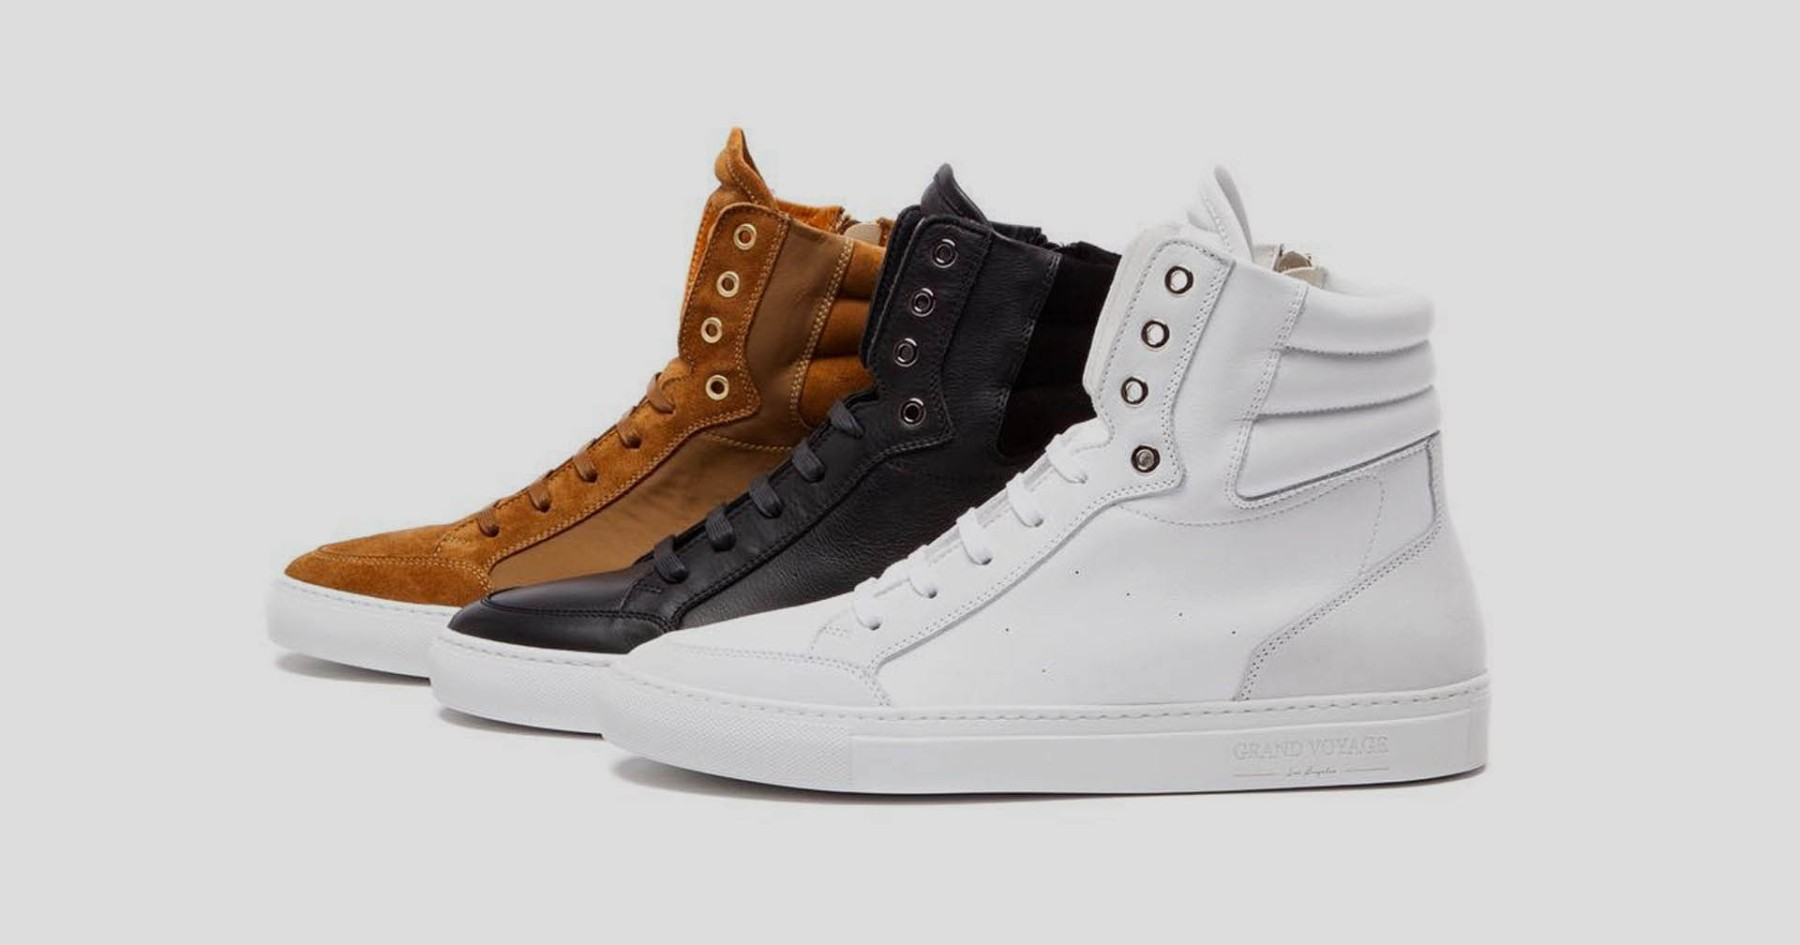 Grand Voyage Makes Designer Shoes at a Bargain